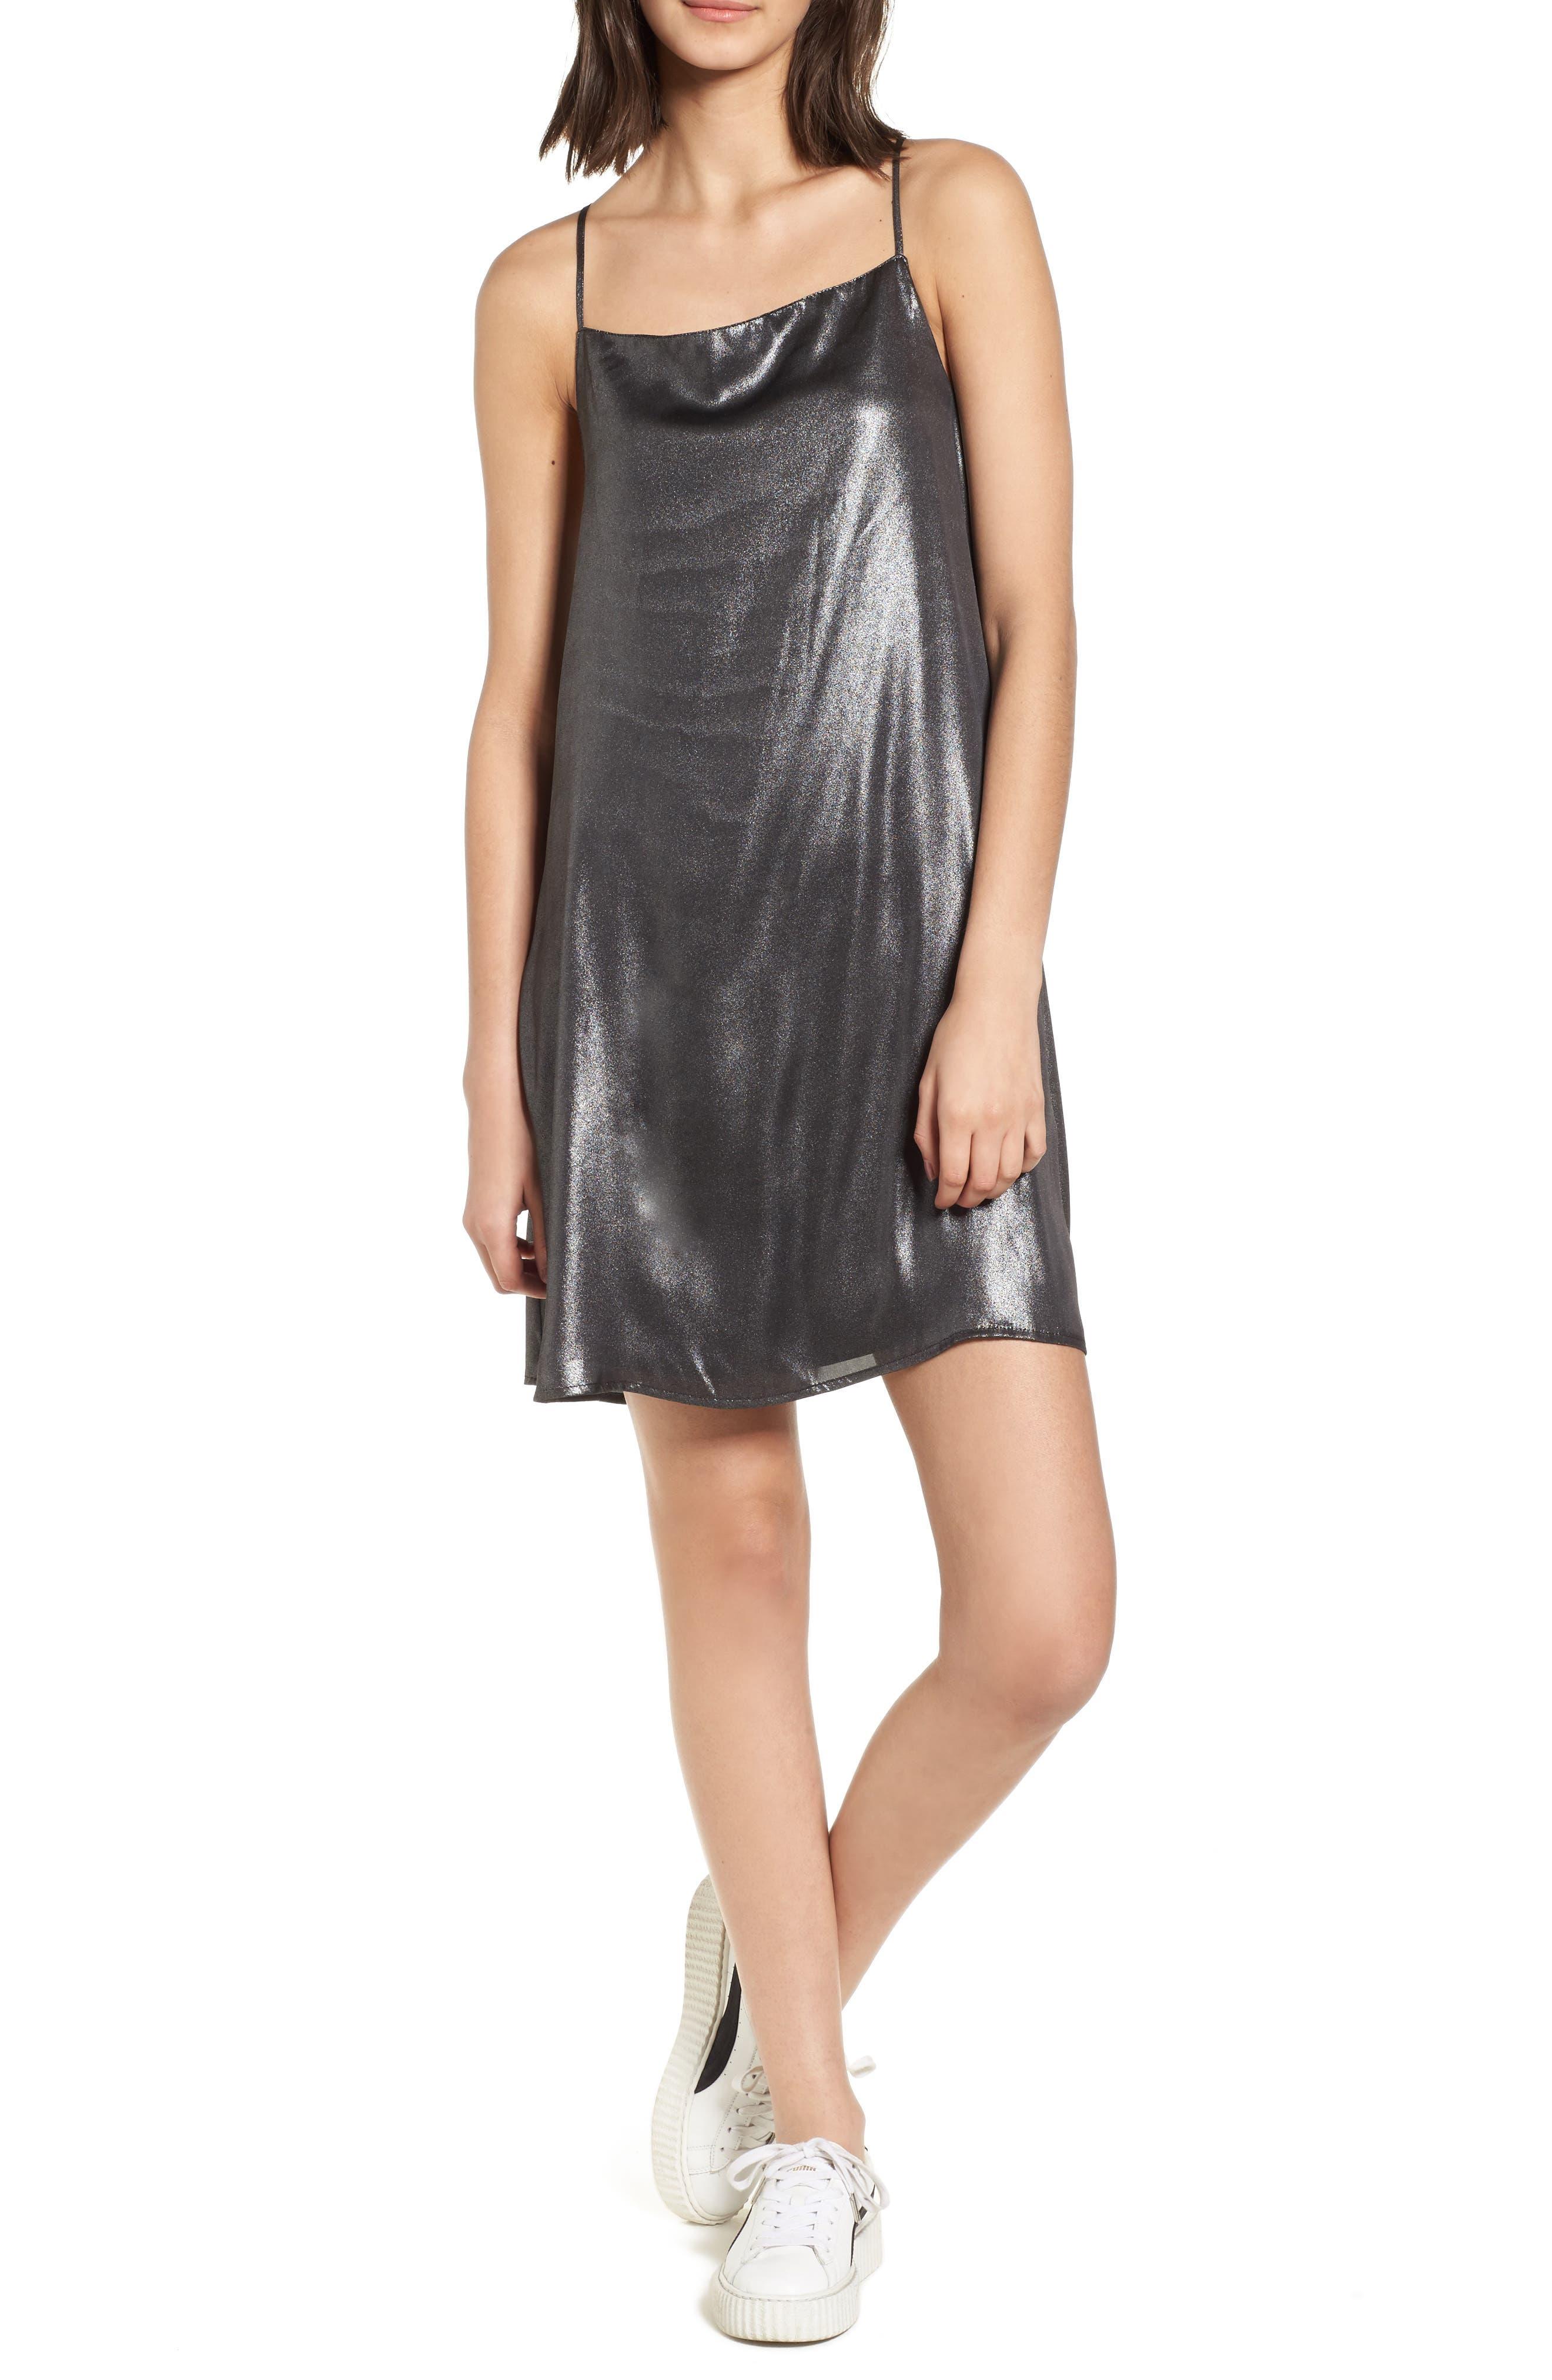 Mental 4 Metal Slipdress,                         Main,                         color, Black/ Silver